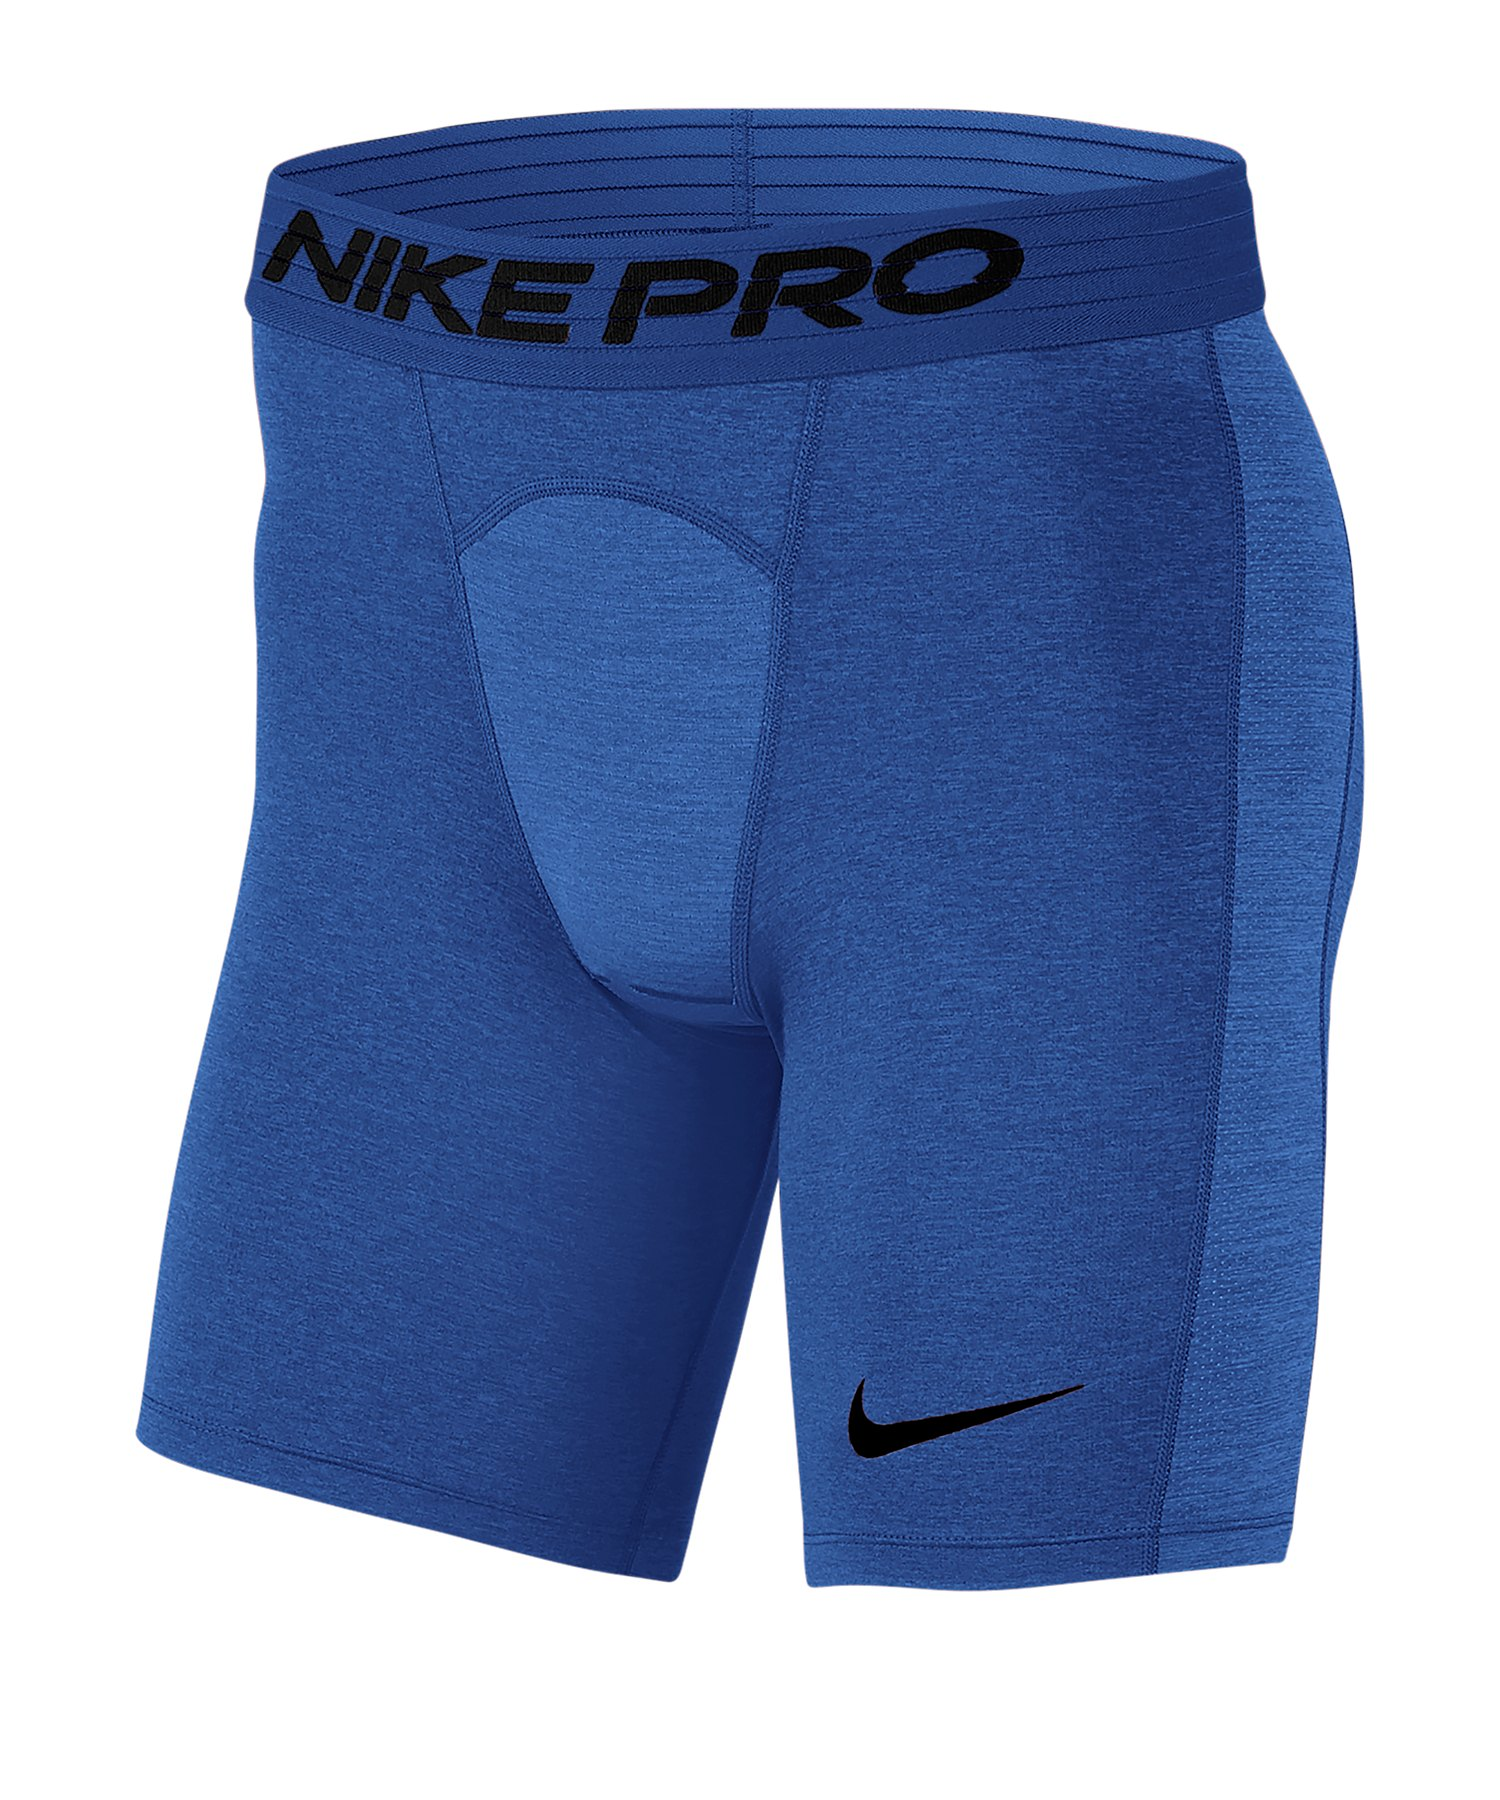 Nike Pro Short Blau F480 - blau